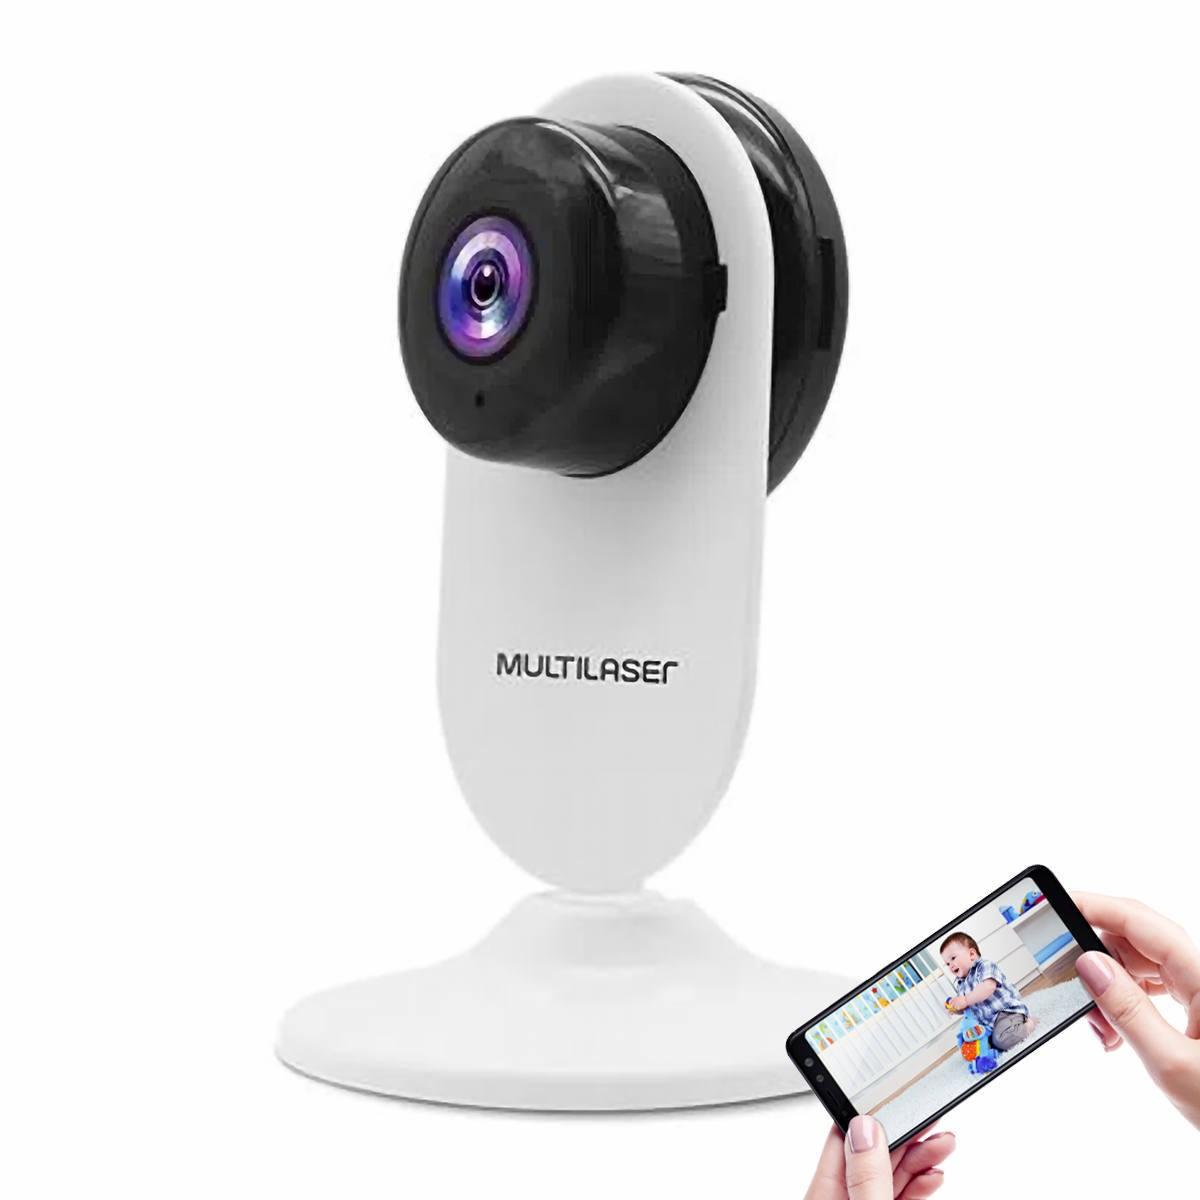 Câmera IP Interna Inteligente Wi-Fi Full HD 3.6mm Áudio Bidirecional Visão Noturna IR 10m Monitore pelo APP Liv SE223